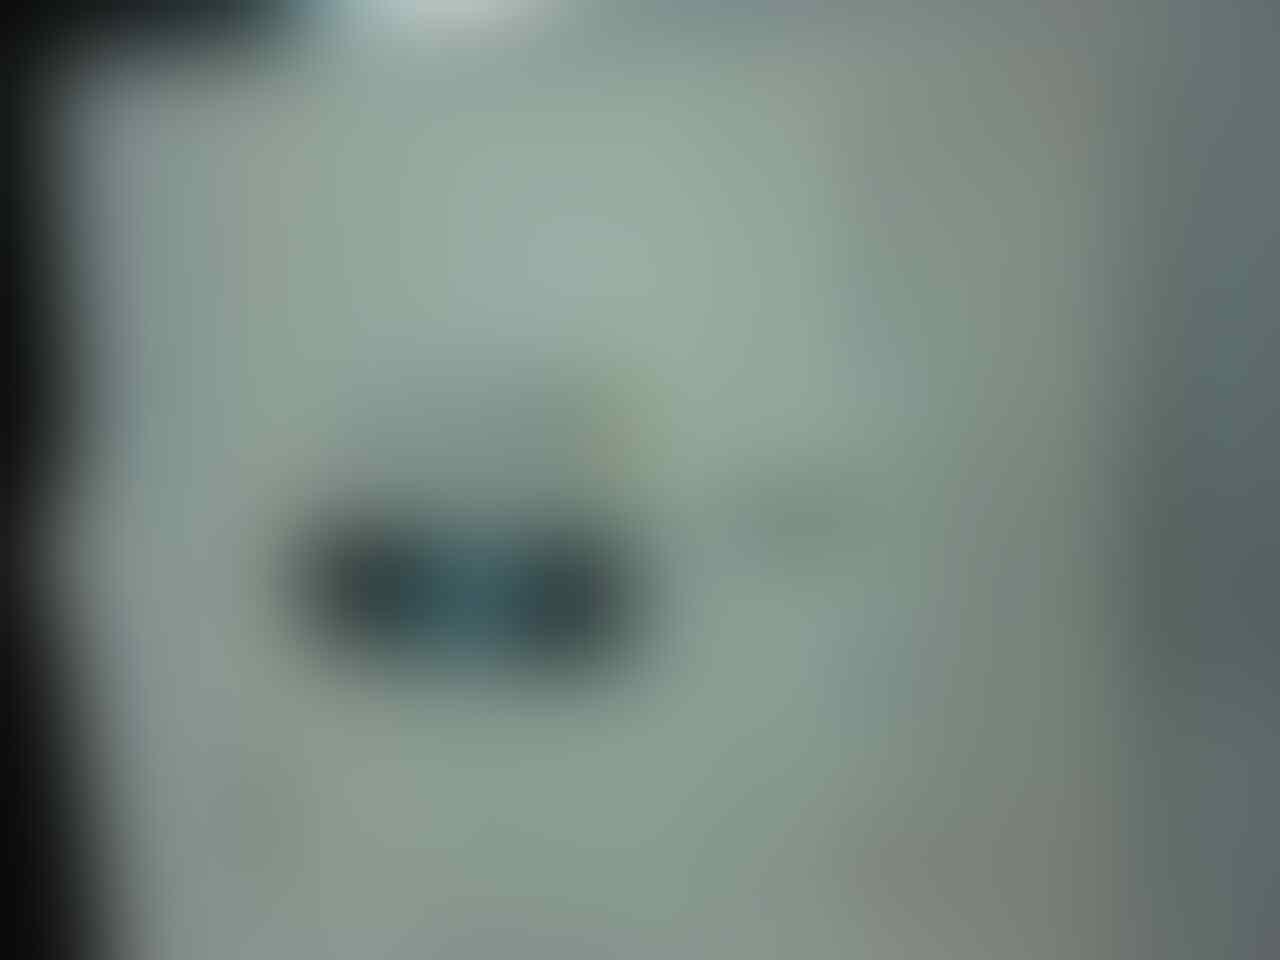 Sony Xperia U St25i White garansi Nov 2013 cuma 1.699 juta